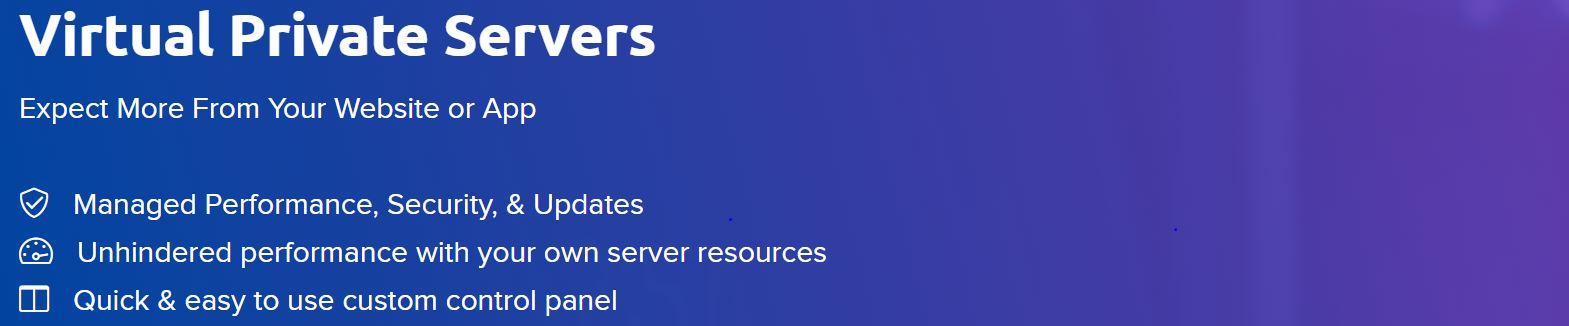 Los servidores privados son útiles para alojar un sitio web.